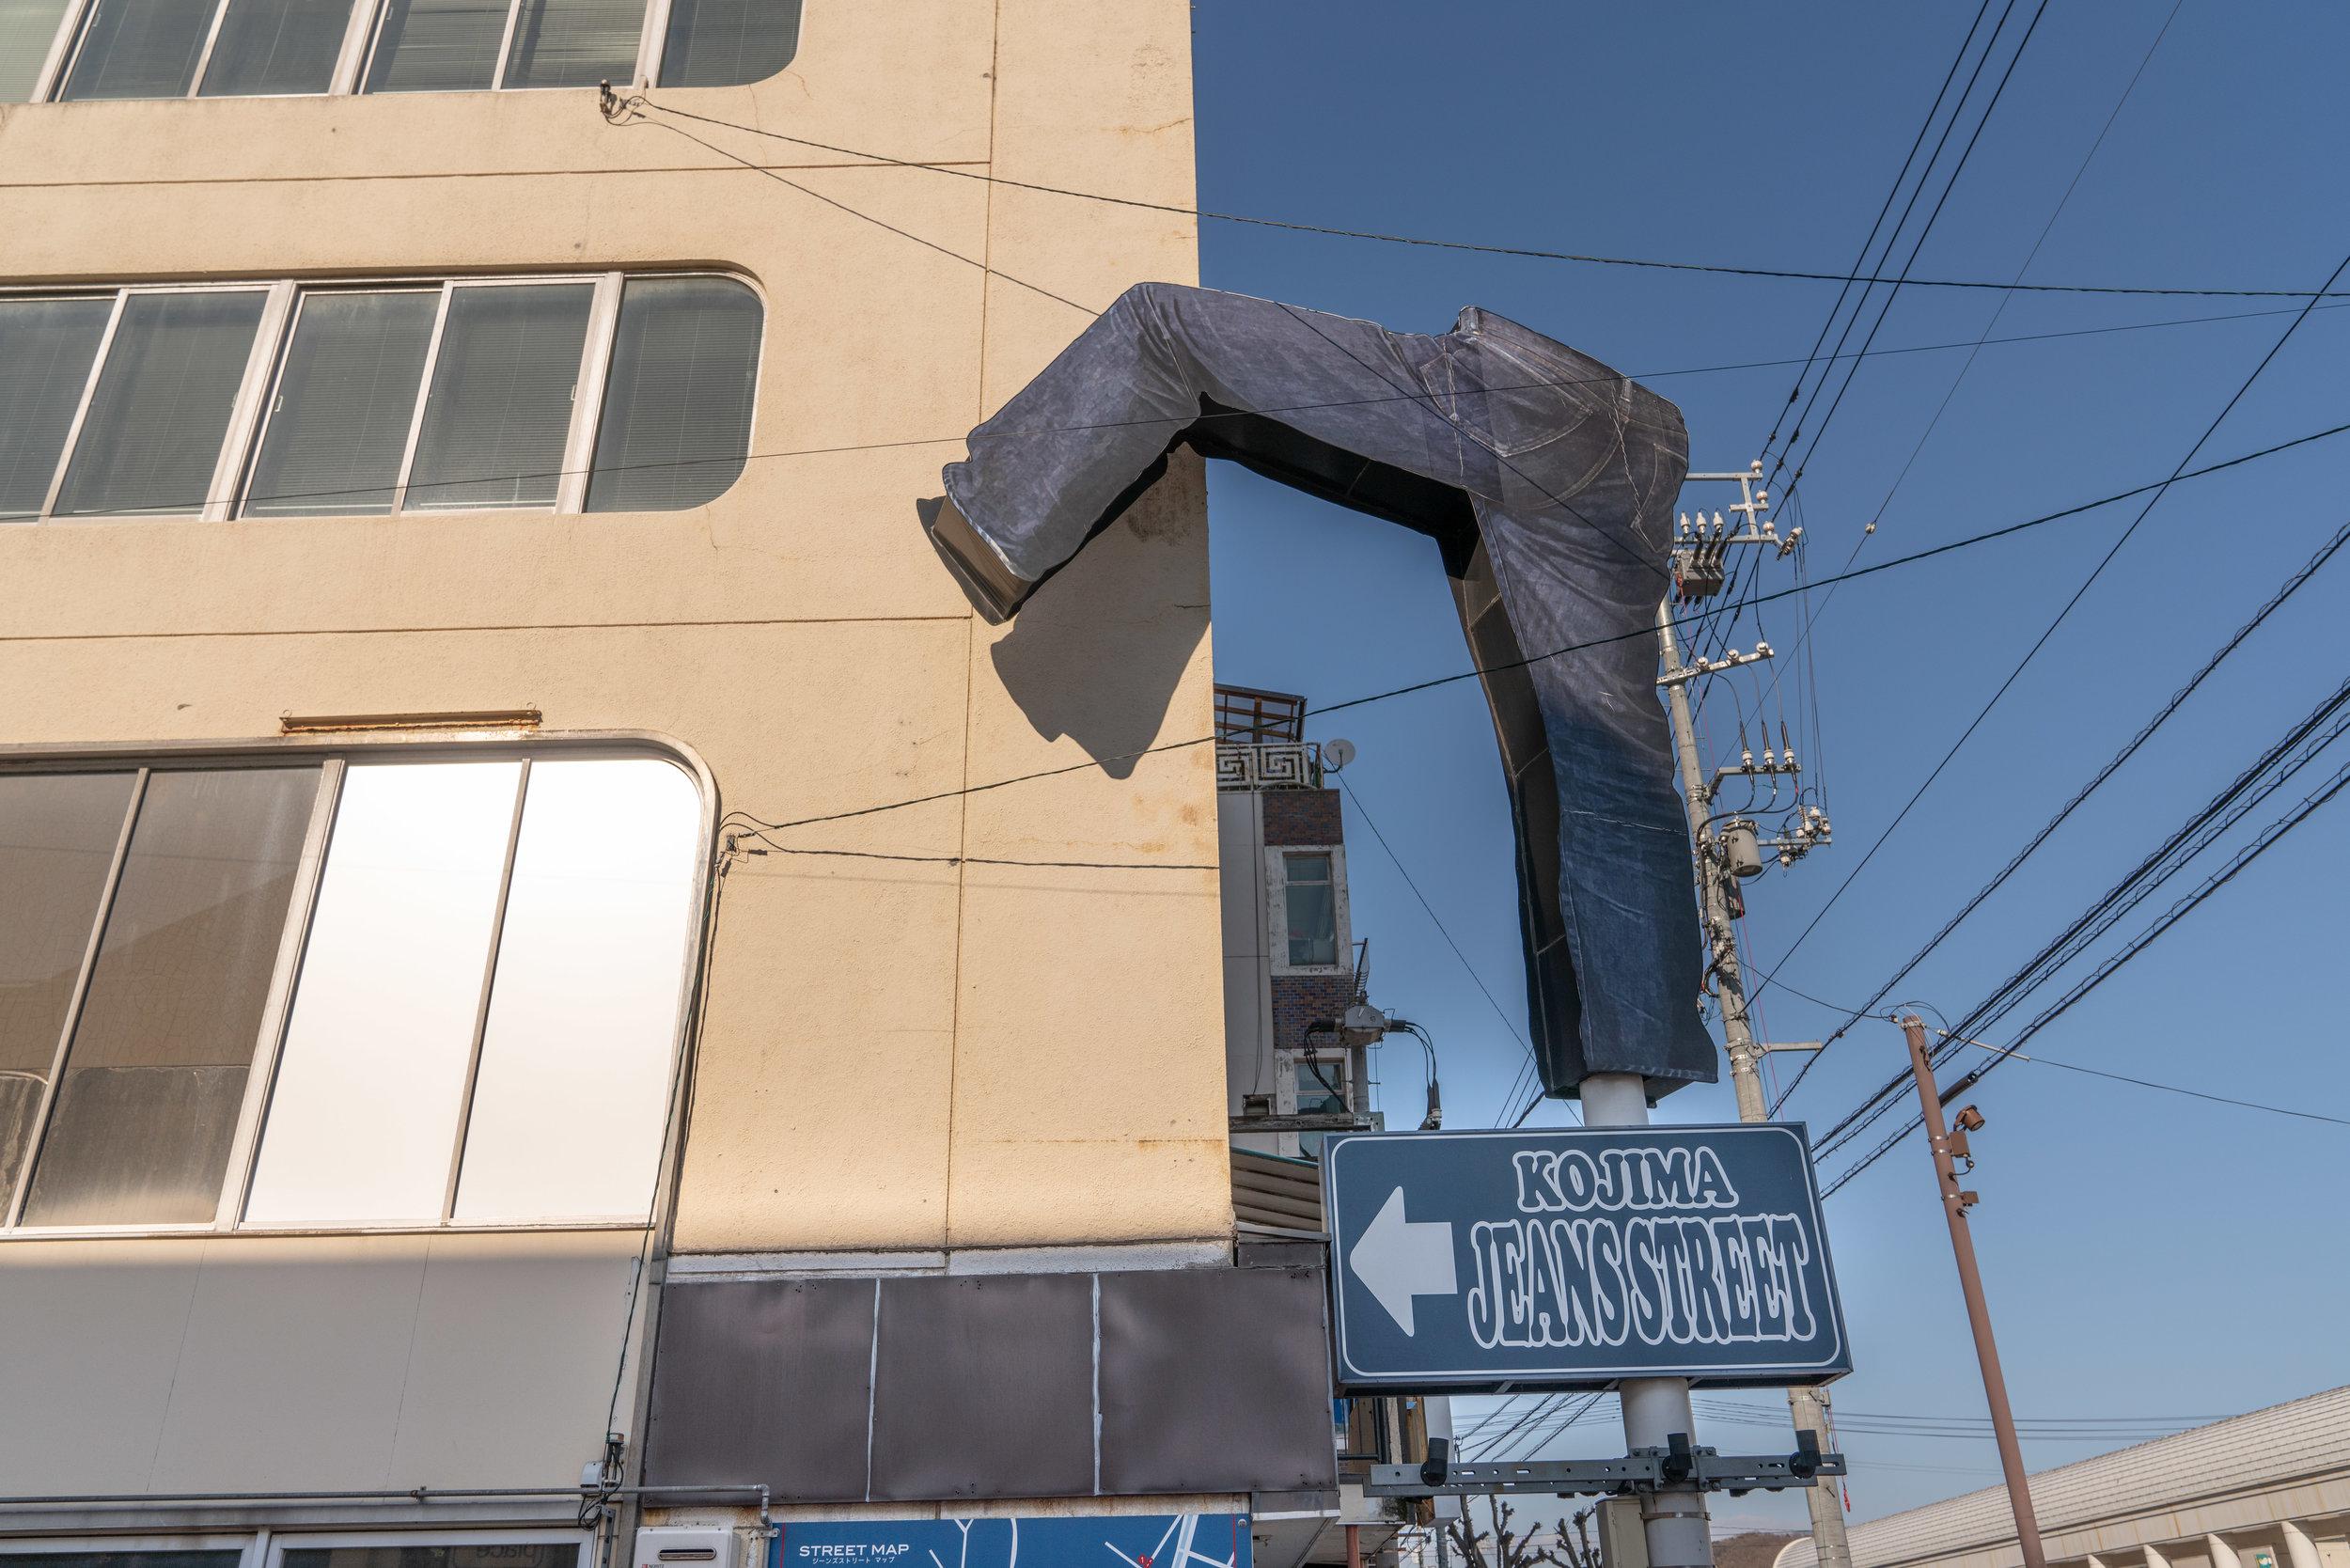 Kojima-Jeans-Street-CKS04361.jpg